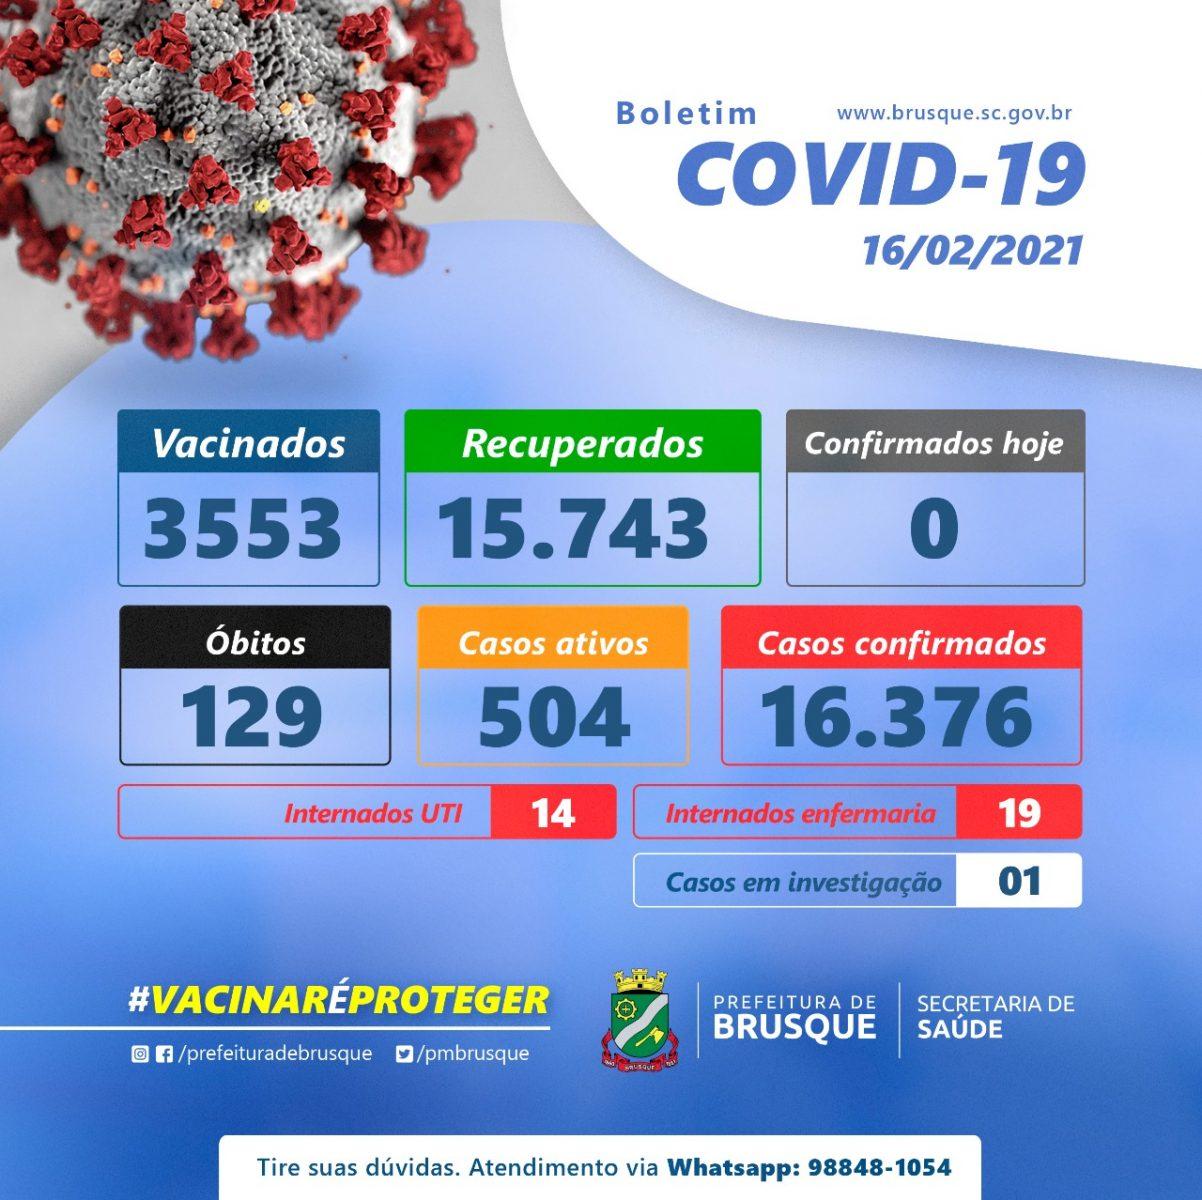 Covid-19: Confira o boletim epidemiológico desta terça-feira (16)